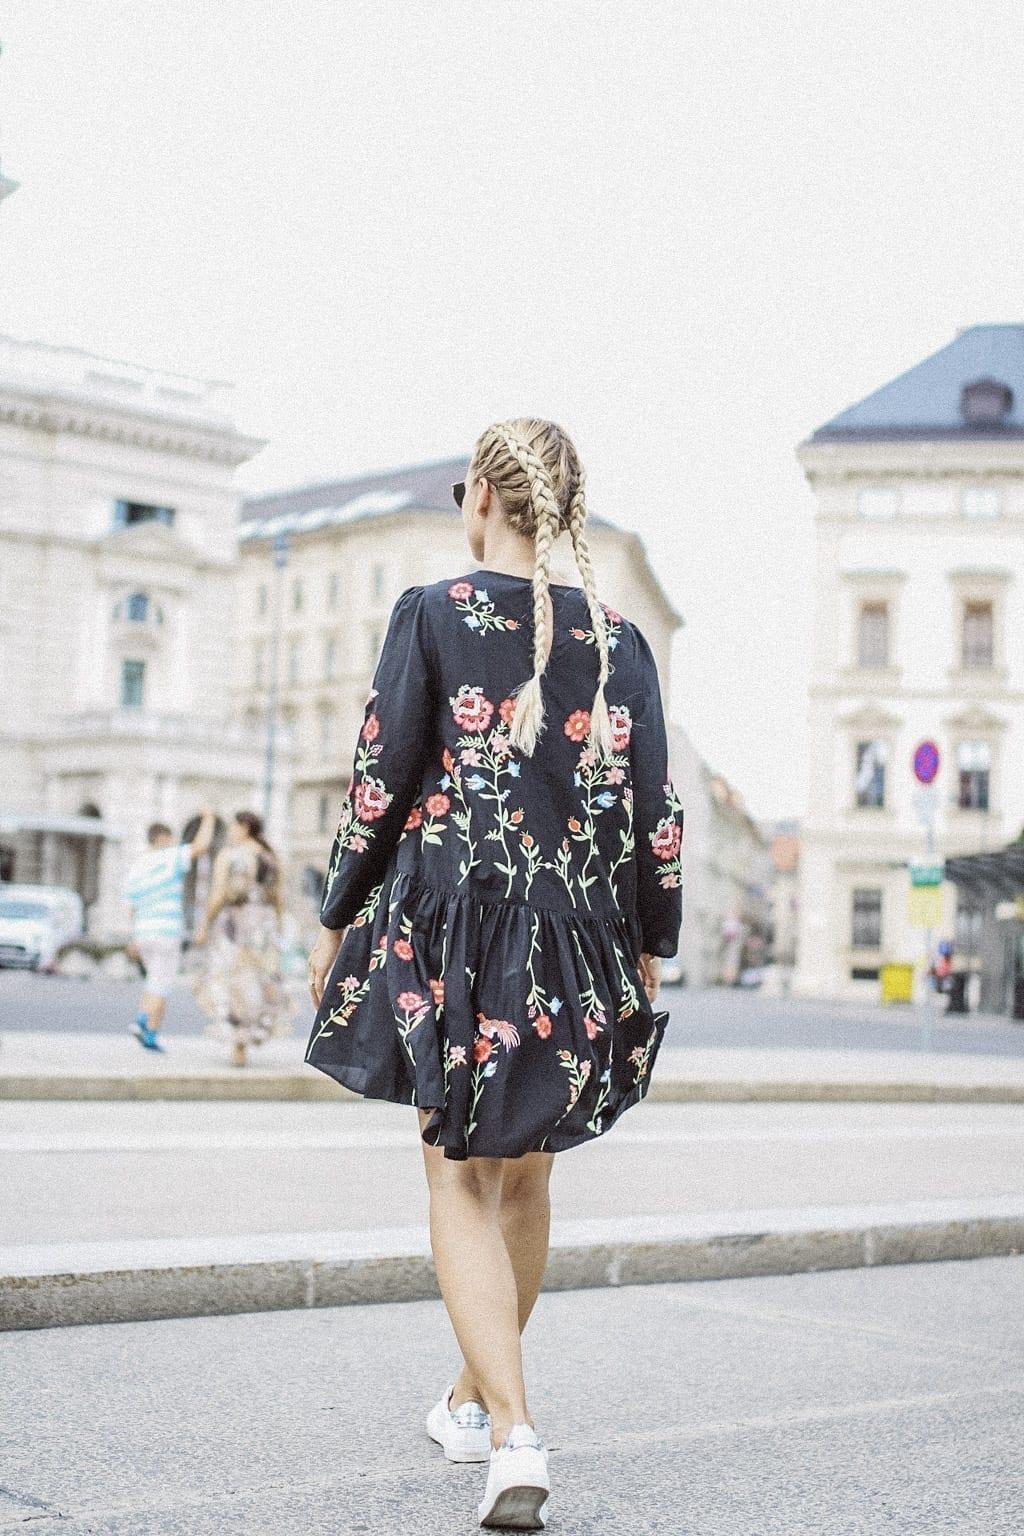 CK-Constantlly-K-Fashion-Street-Style-vienna-constantlyk.com-1222